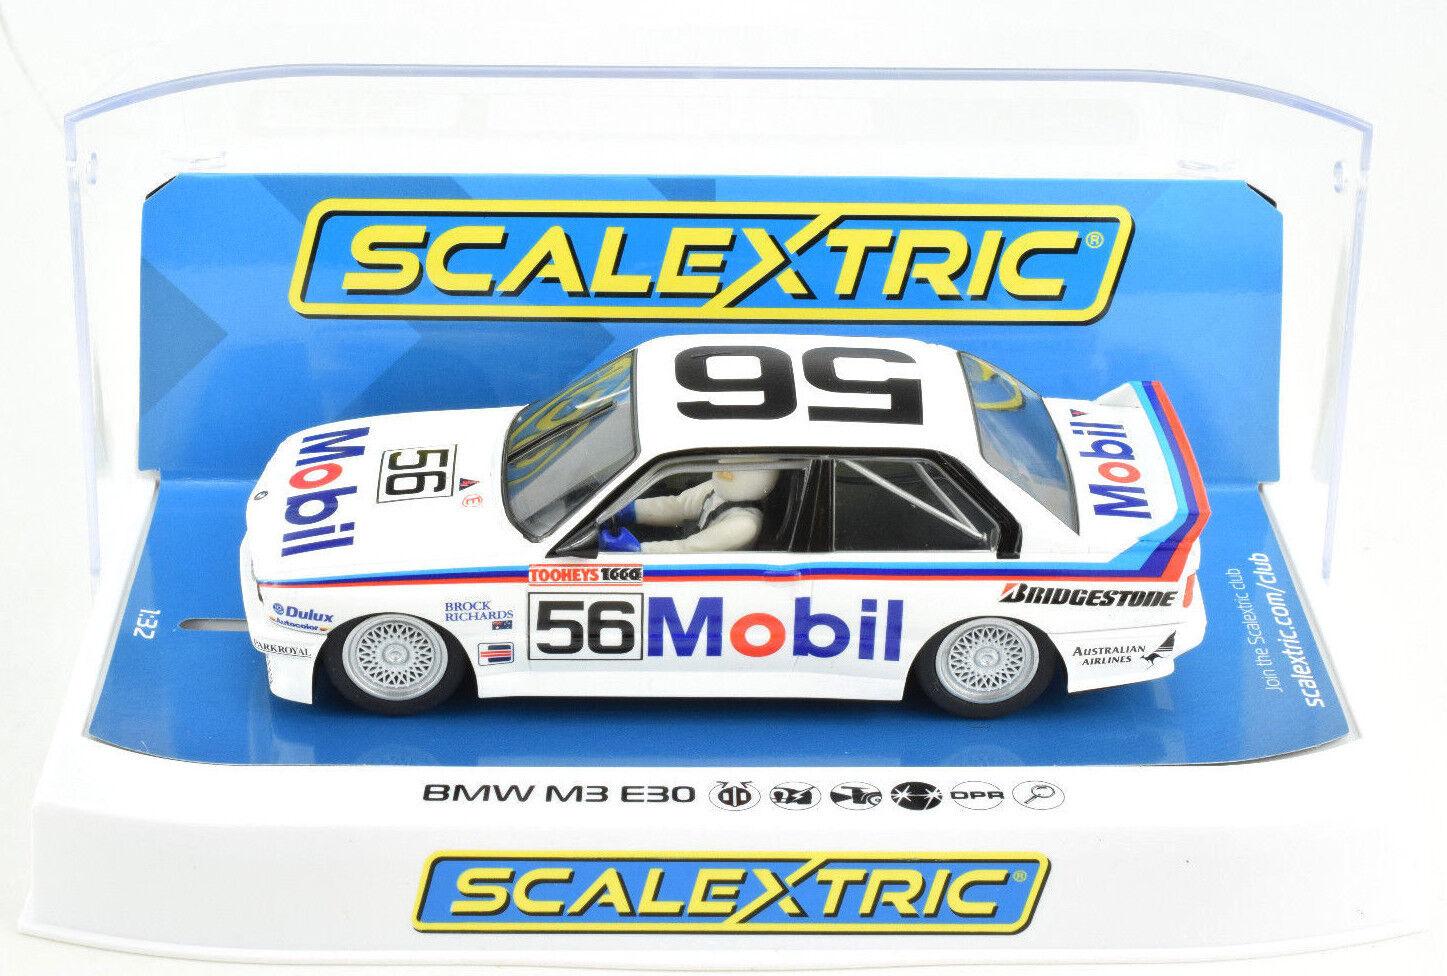 Scalextric  Mobil  BMW E30 M3 - Bathurst DPR W  Lights 1 32 Scale Slot Car C3929